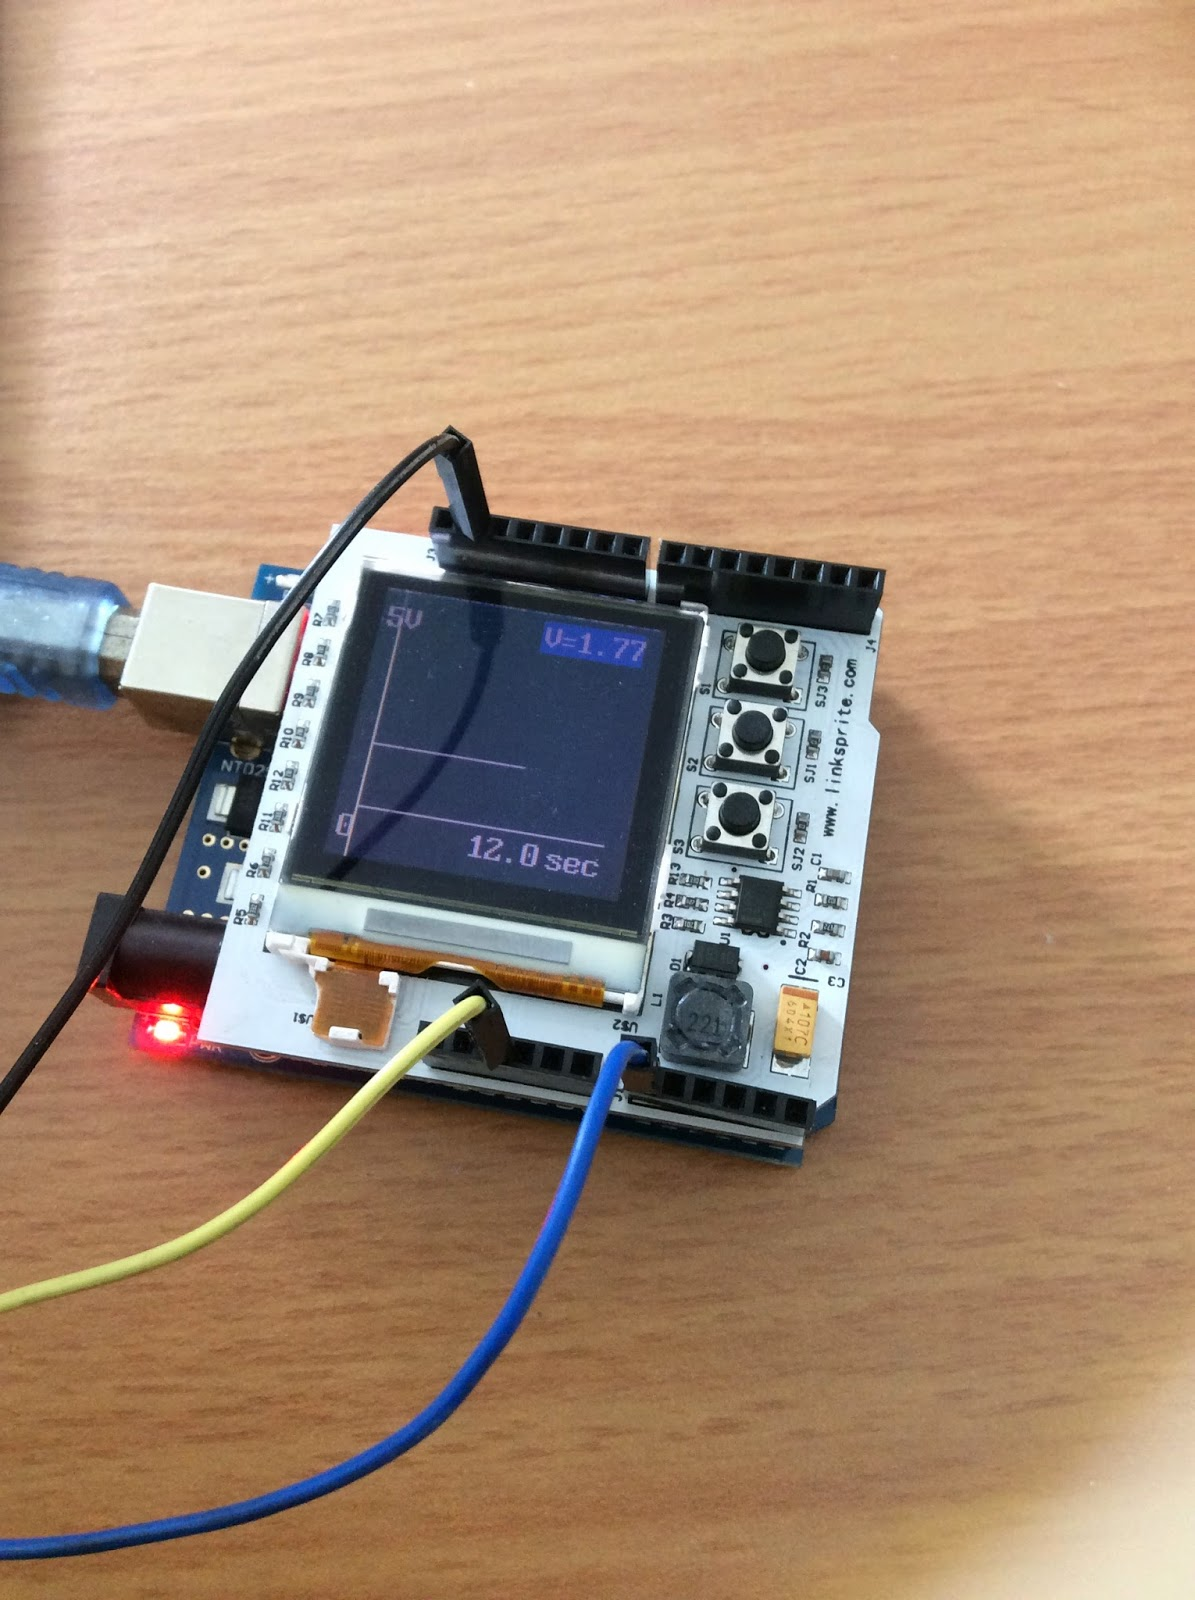 Project oscilloscope arduino รับทำโปรเจค ทำ hardware